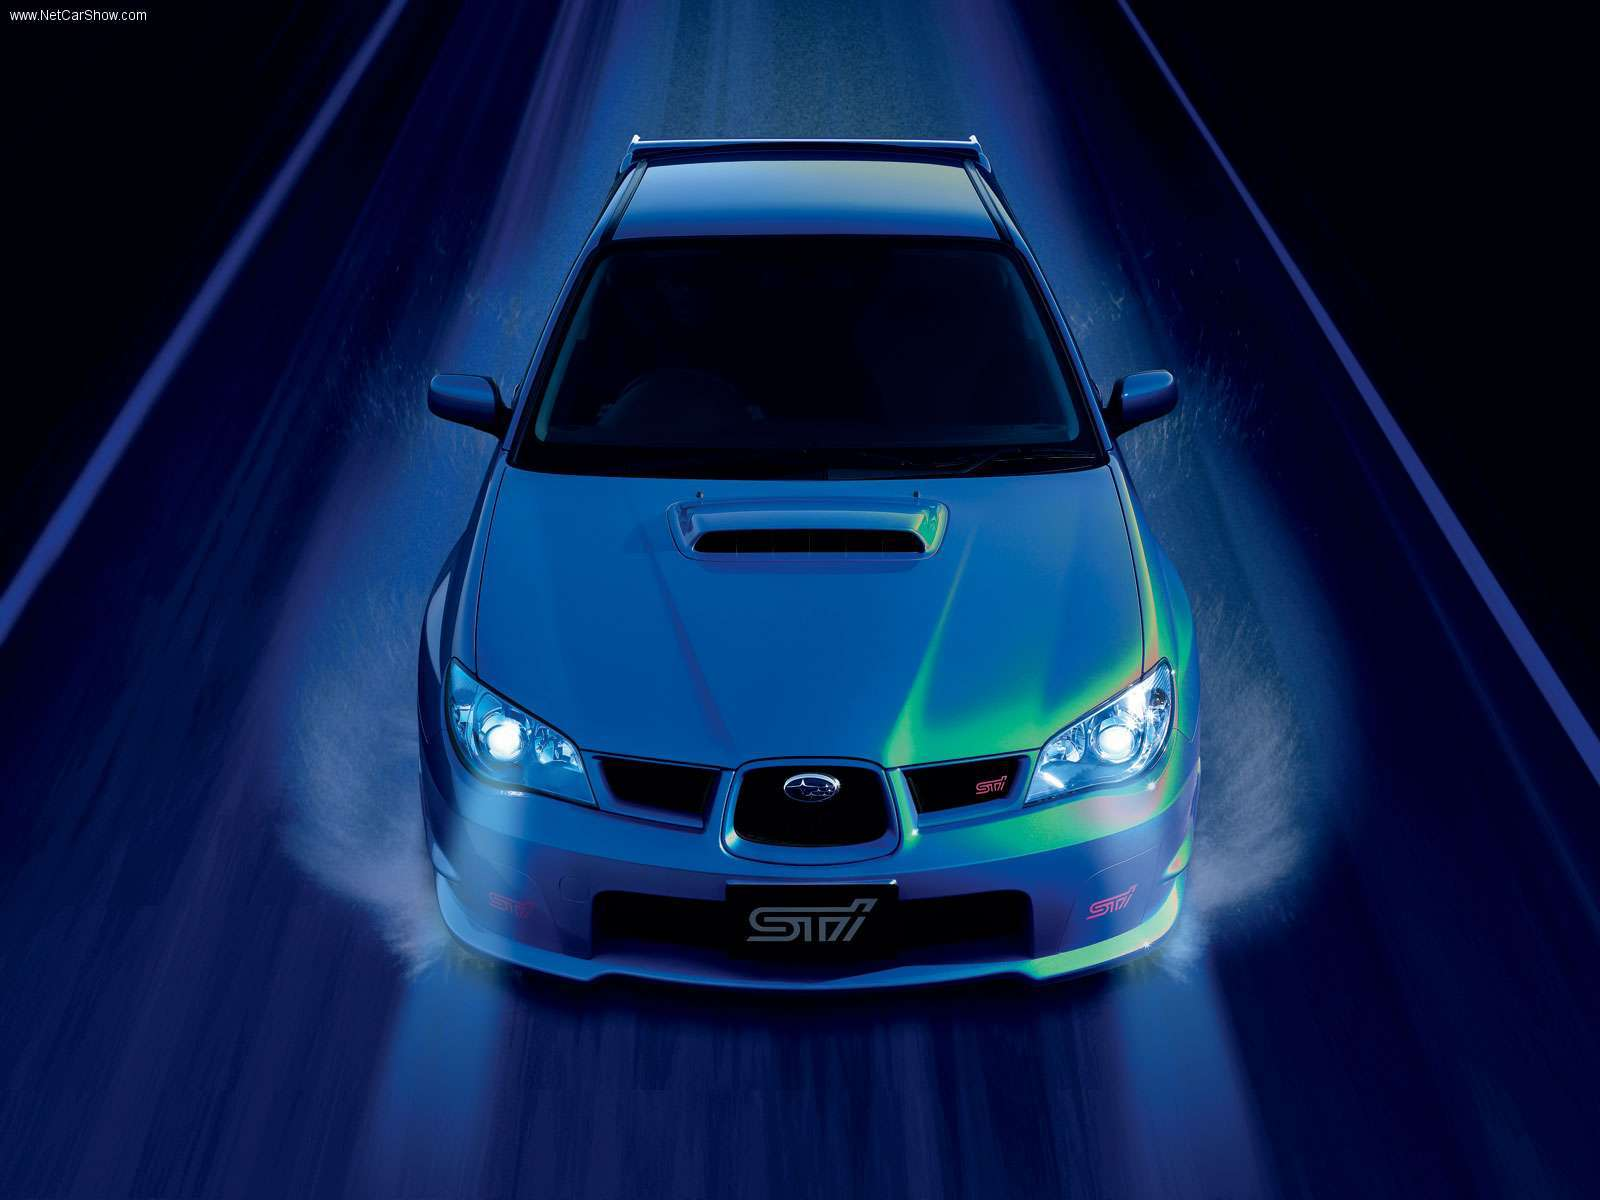 Subaru Impreza Wrx Sti Wallpaper Hd HD4Wallpapernet 1600x1200